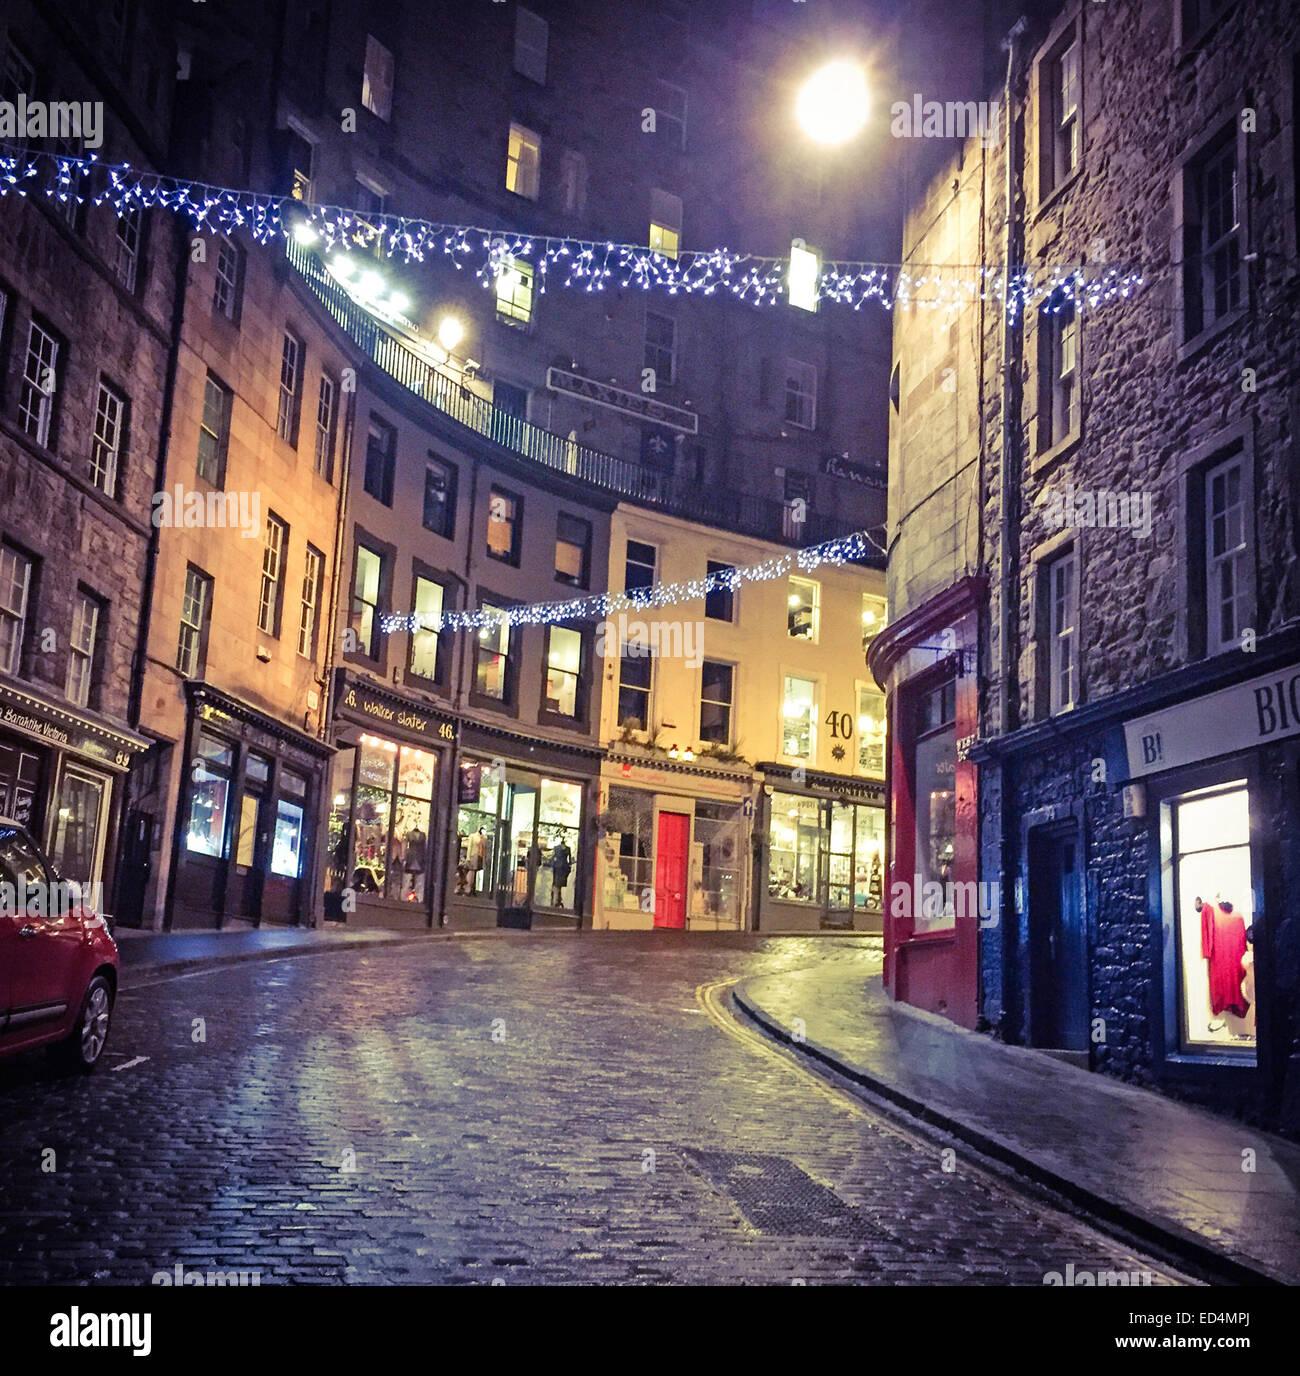 Looking up Edinburgh's Historic Victoria St, City Centre, Lothian, Scotland, UK at night - Stock Image